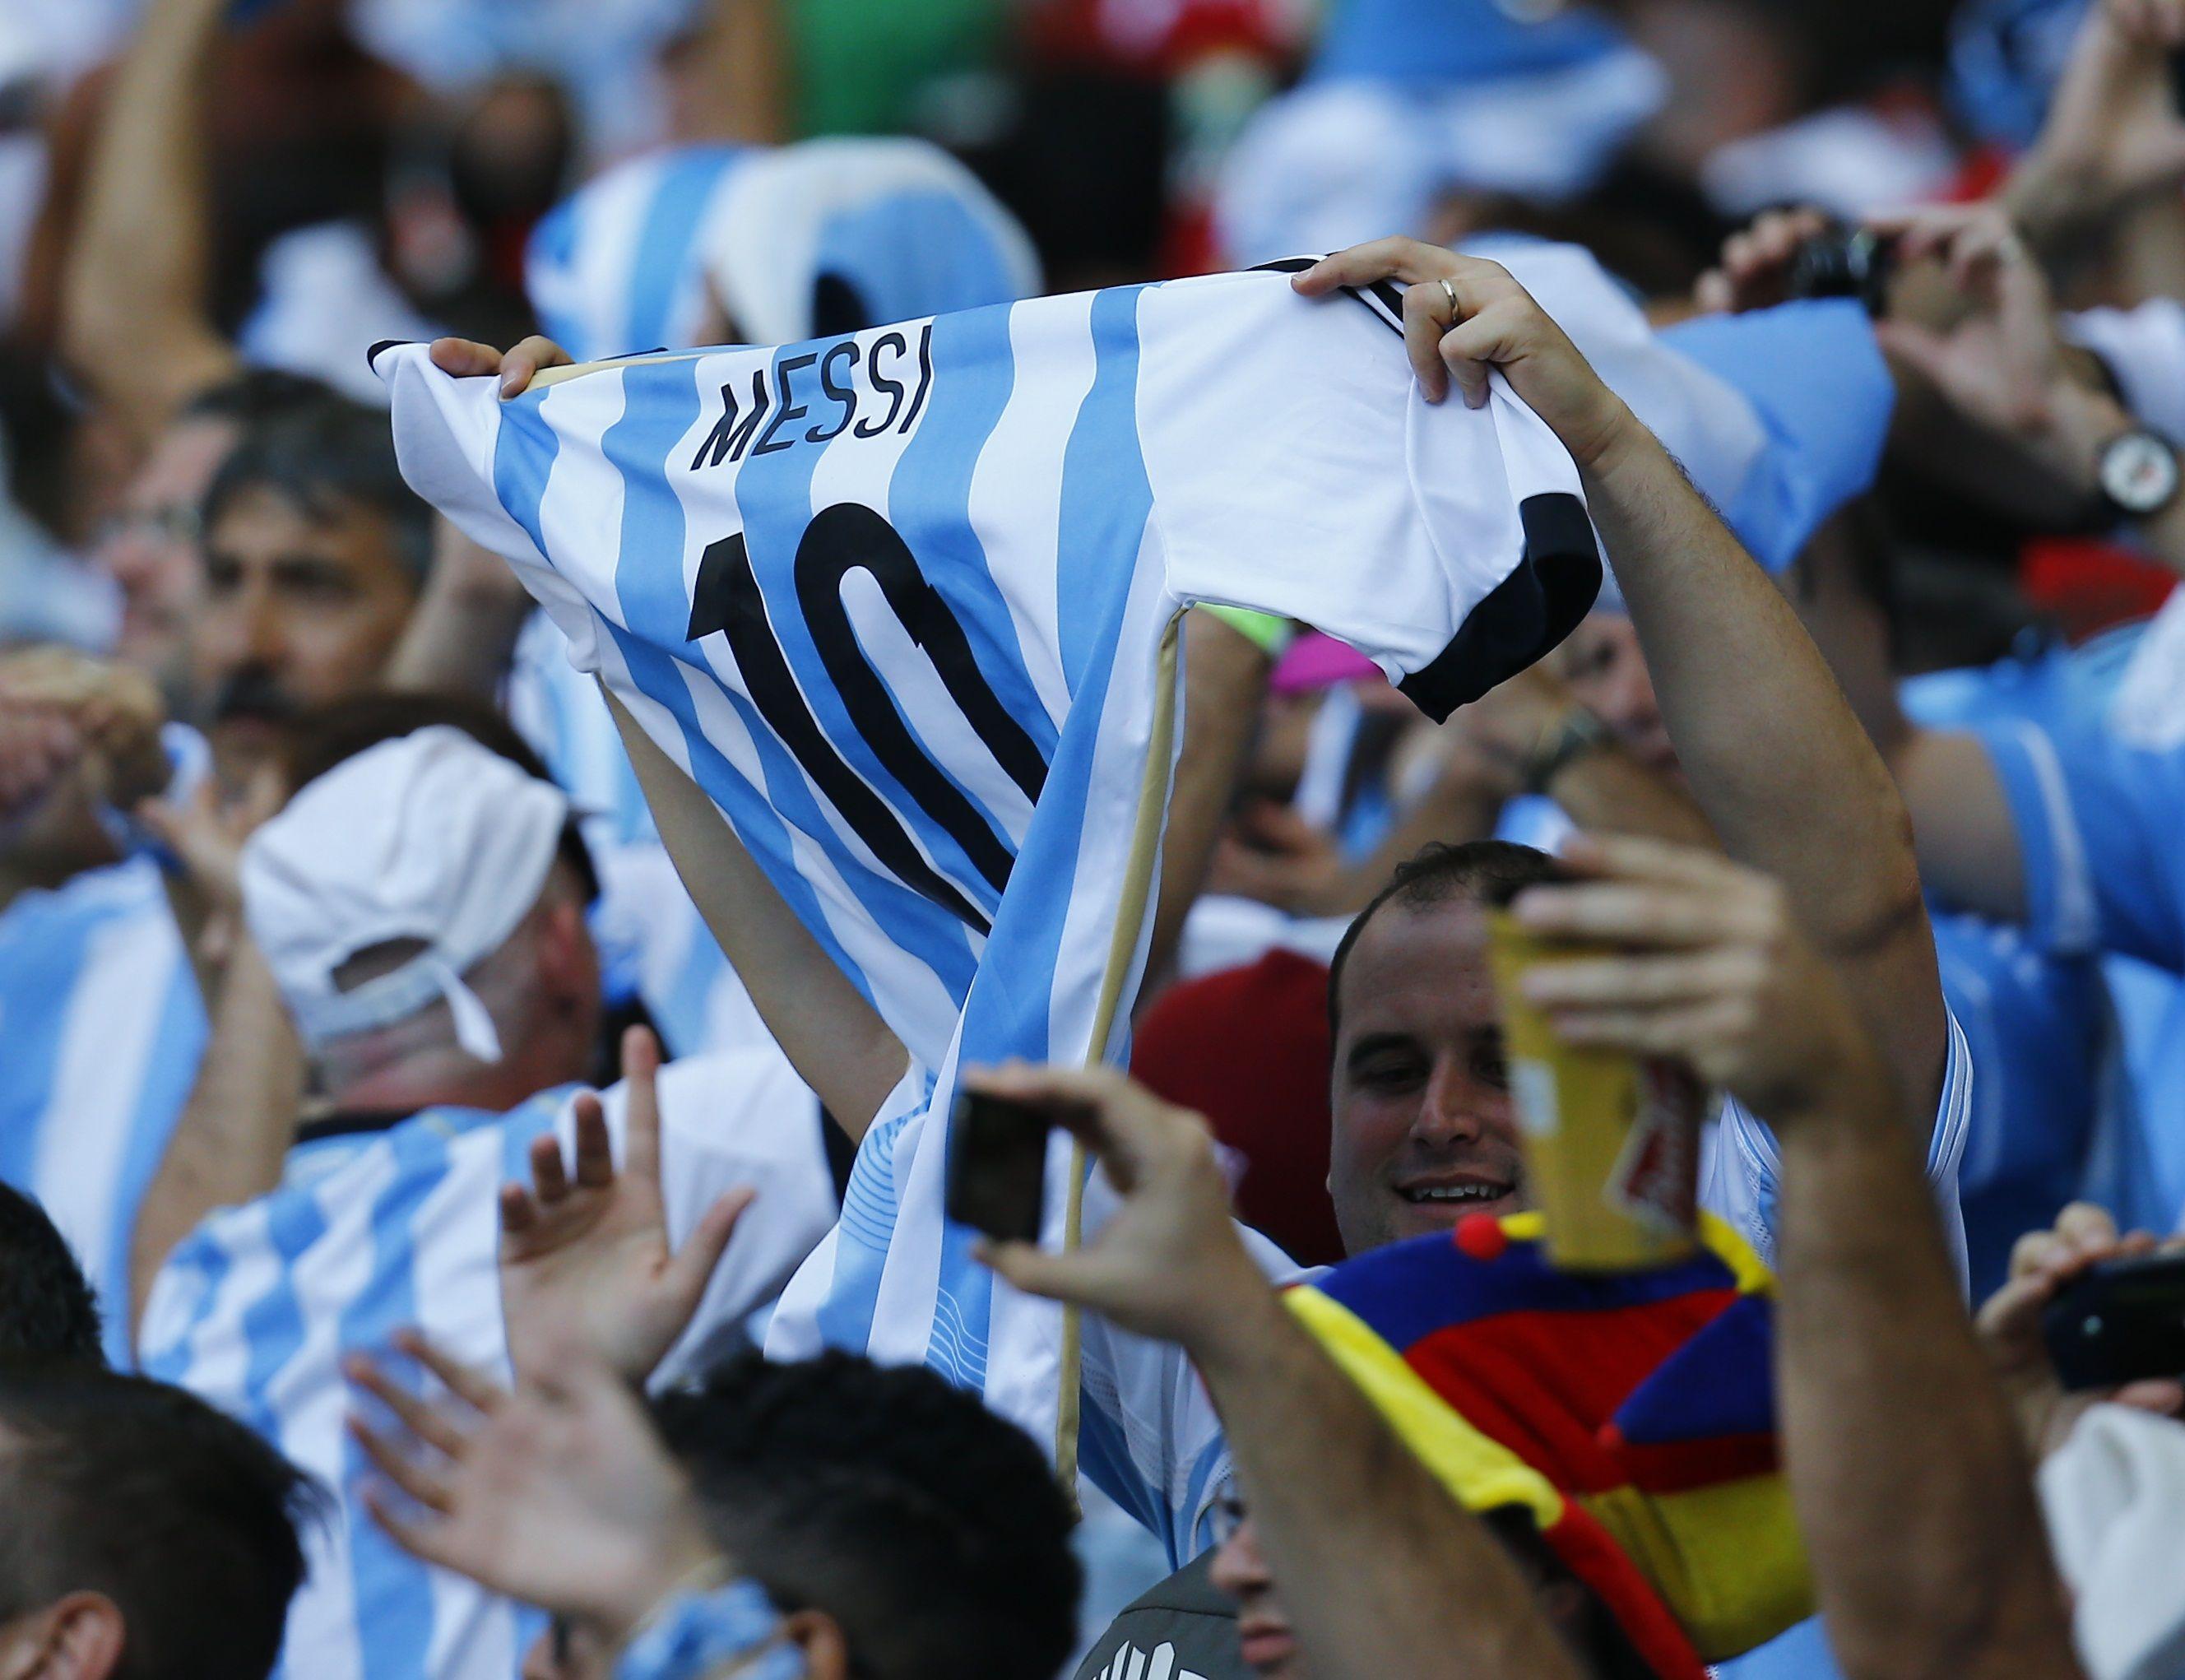 Coupe du monde : l'Albiceleste sera toujours l'Albiceleste !